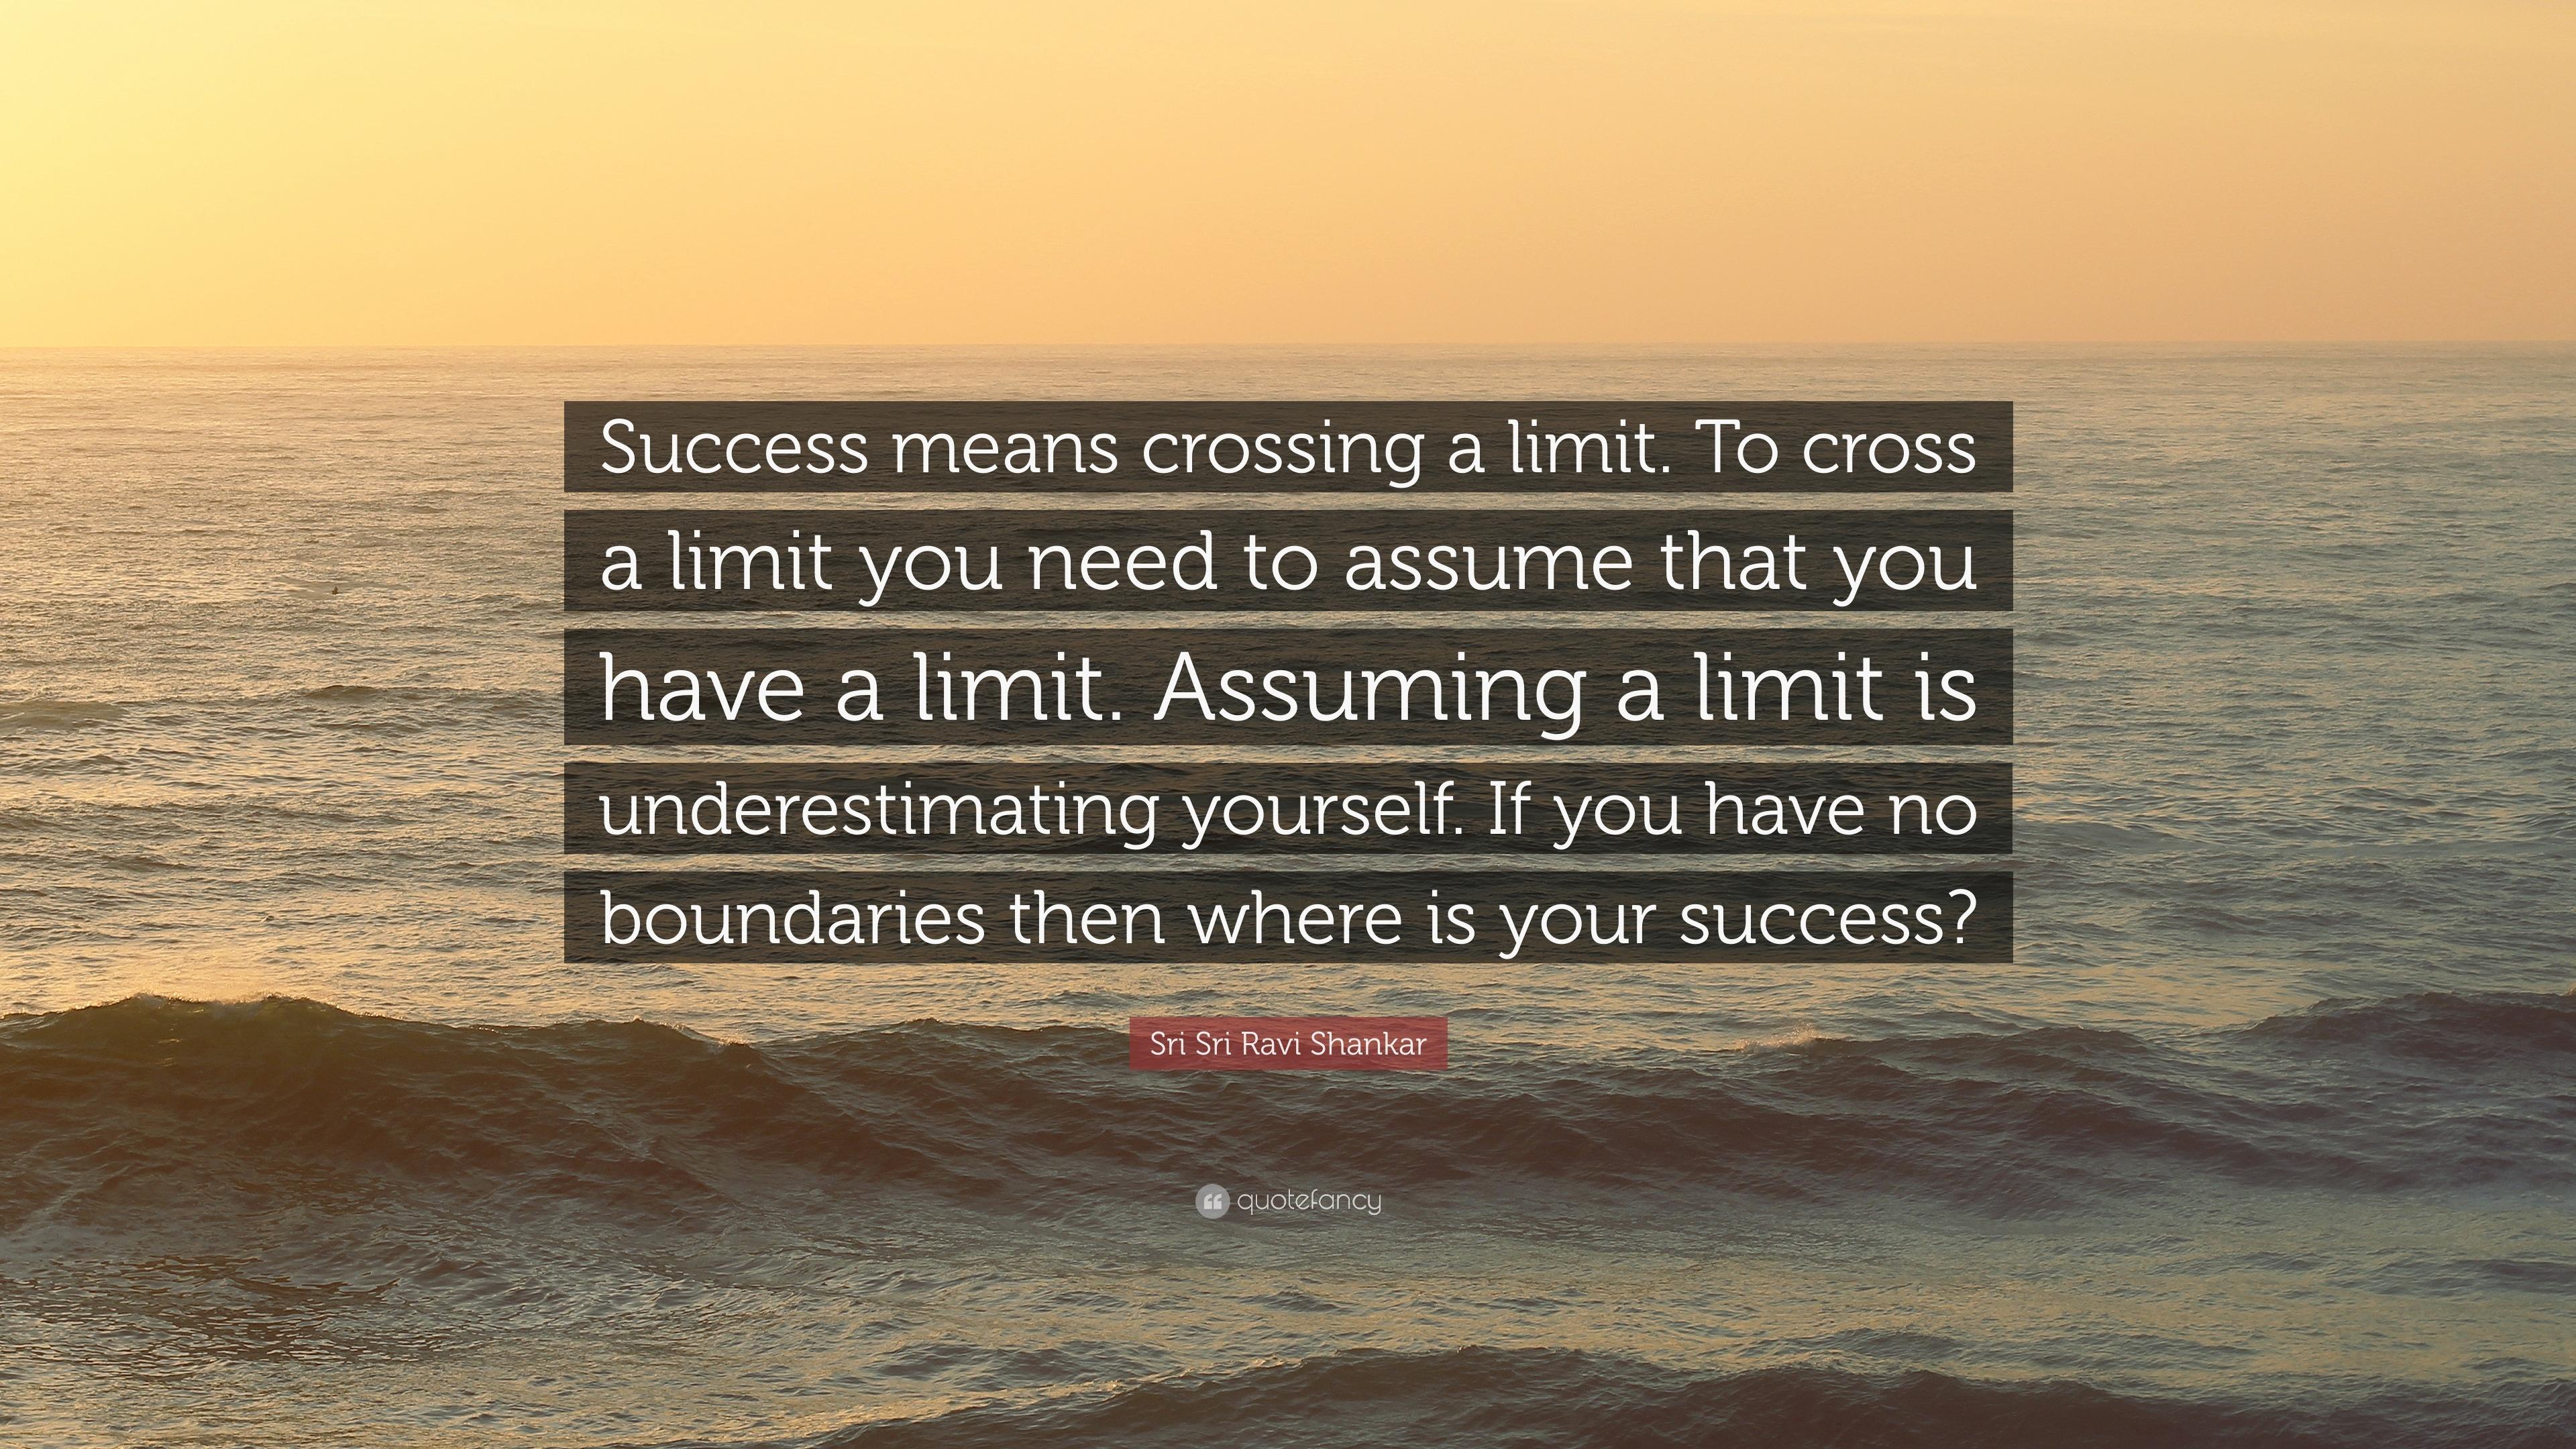 Sri Sri Ravi Shankar Quote Success Means Crossing A Limit To